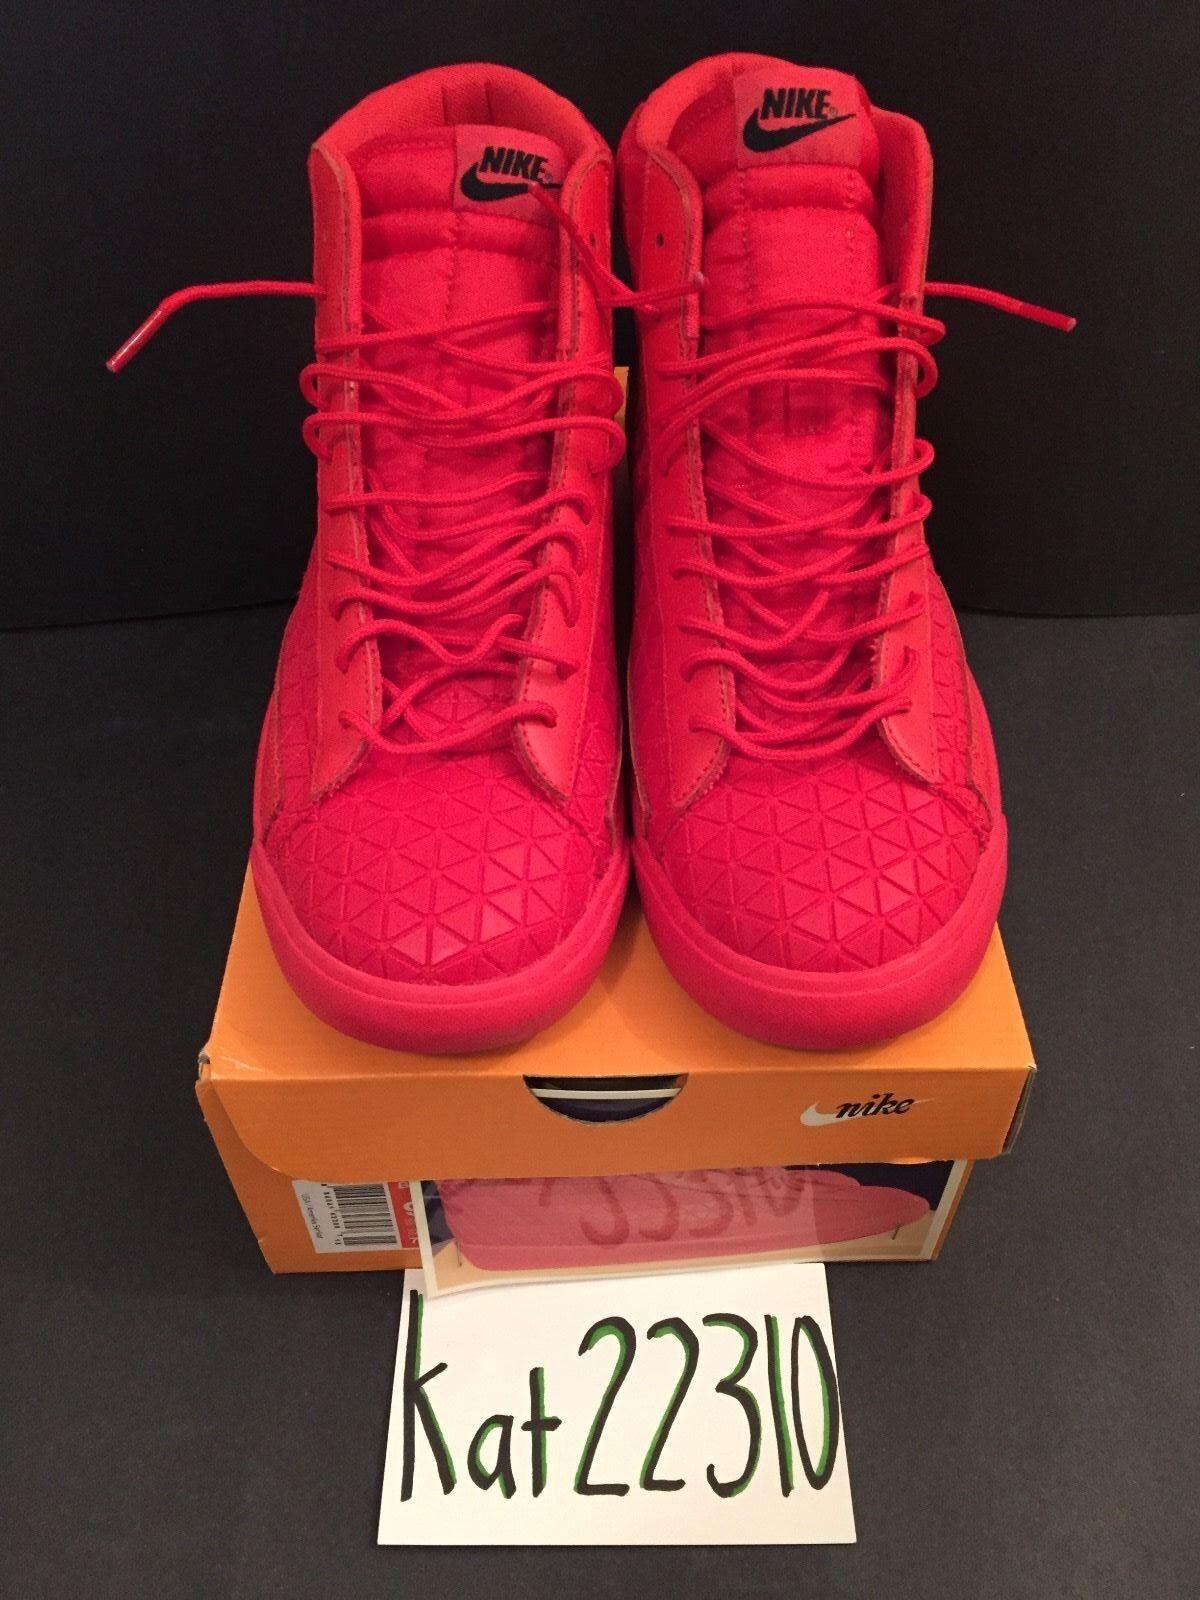 Nike blazer rosso metà metrica qs rosso blazer dimensioni 9.5 71b8d5